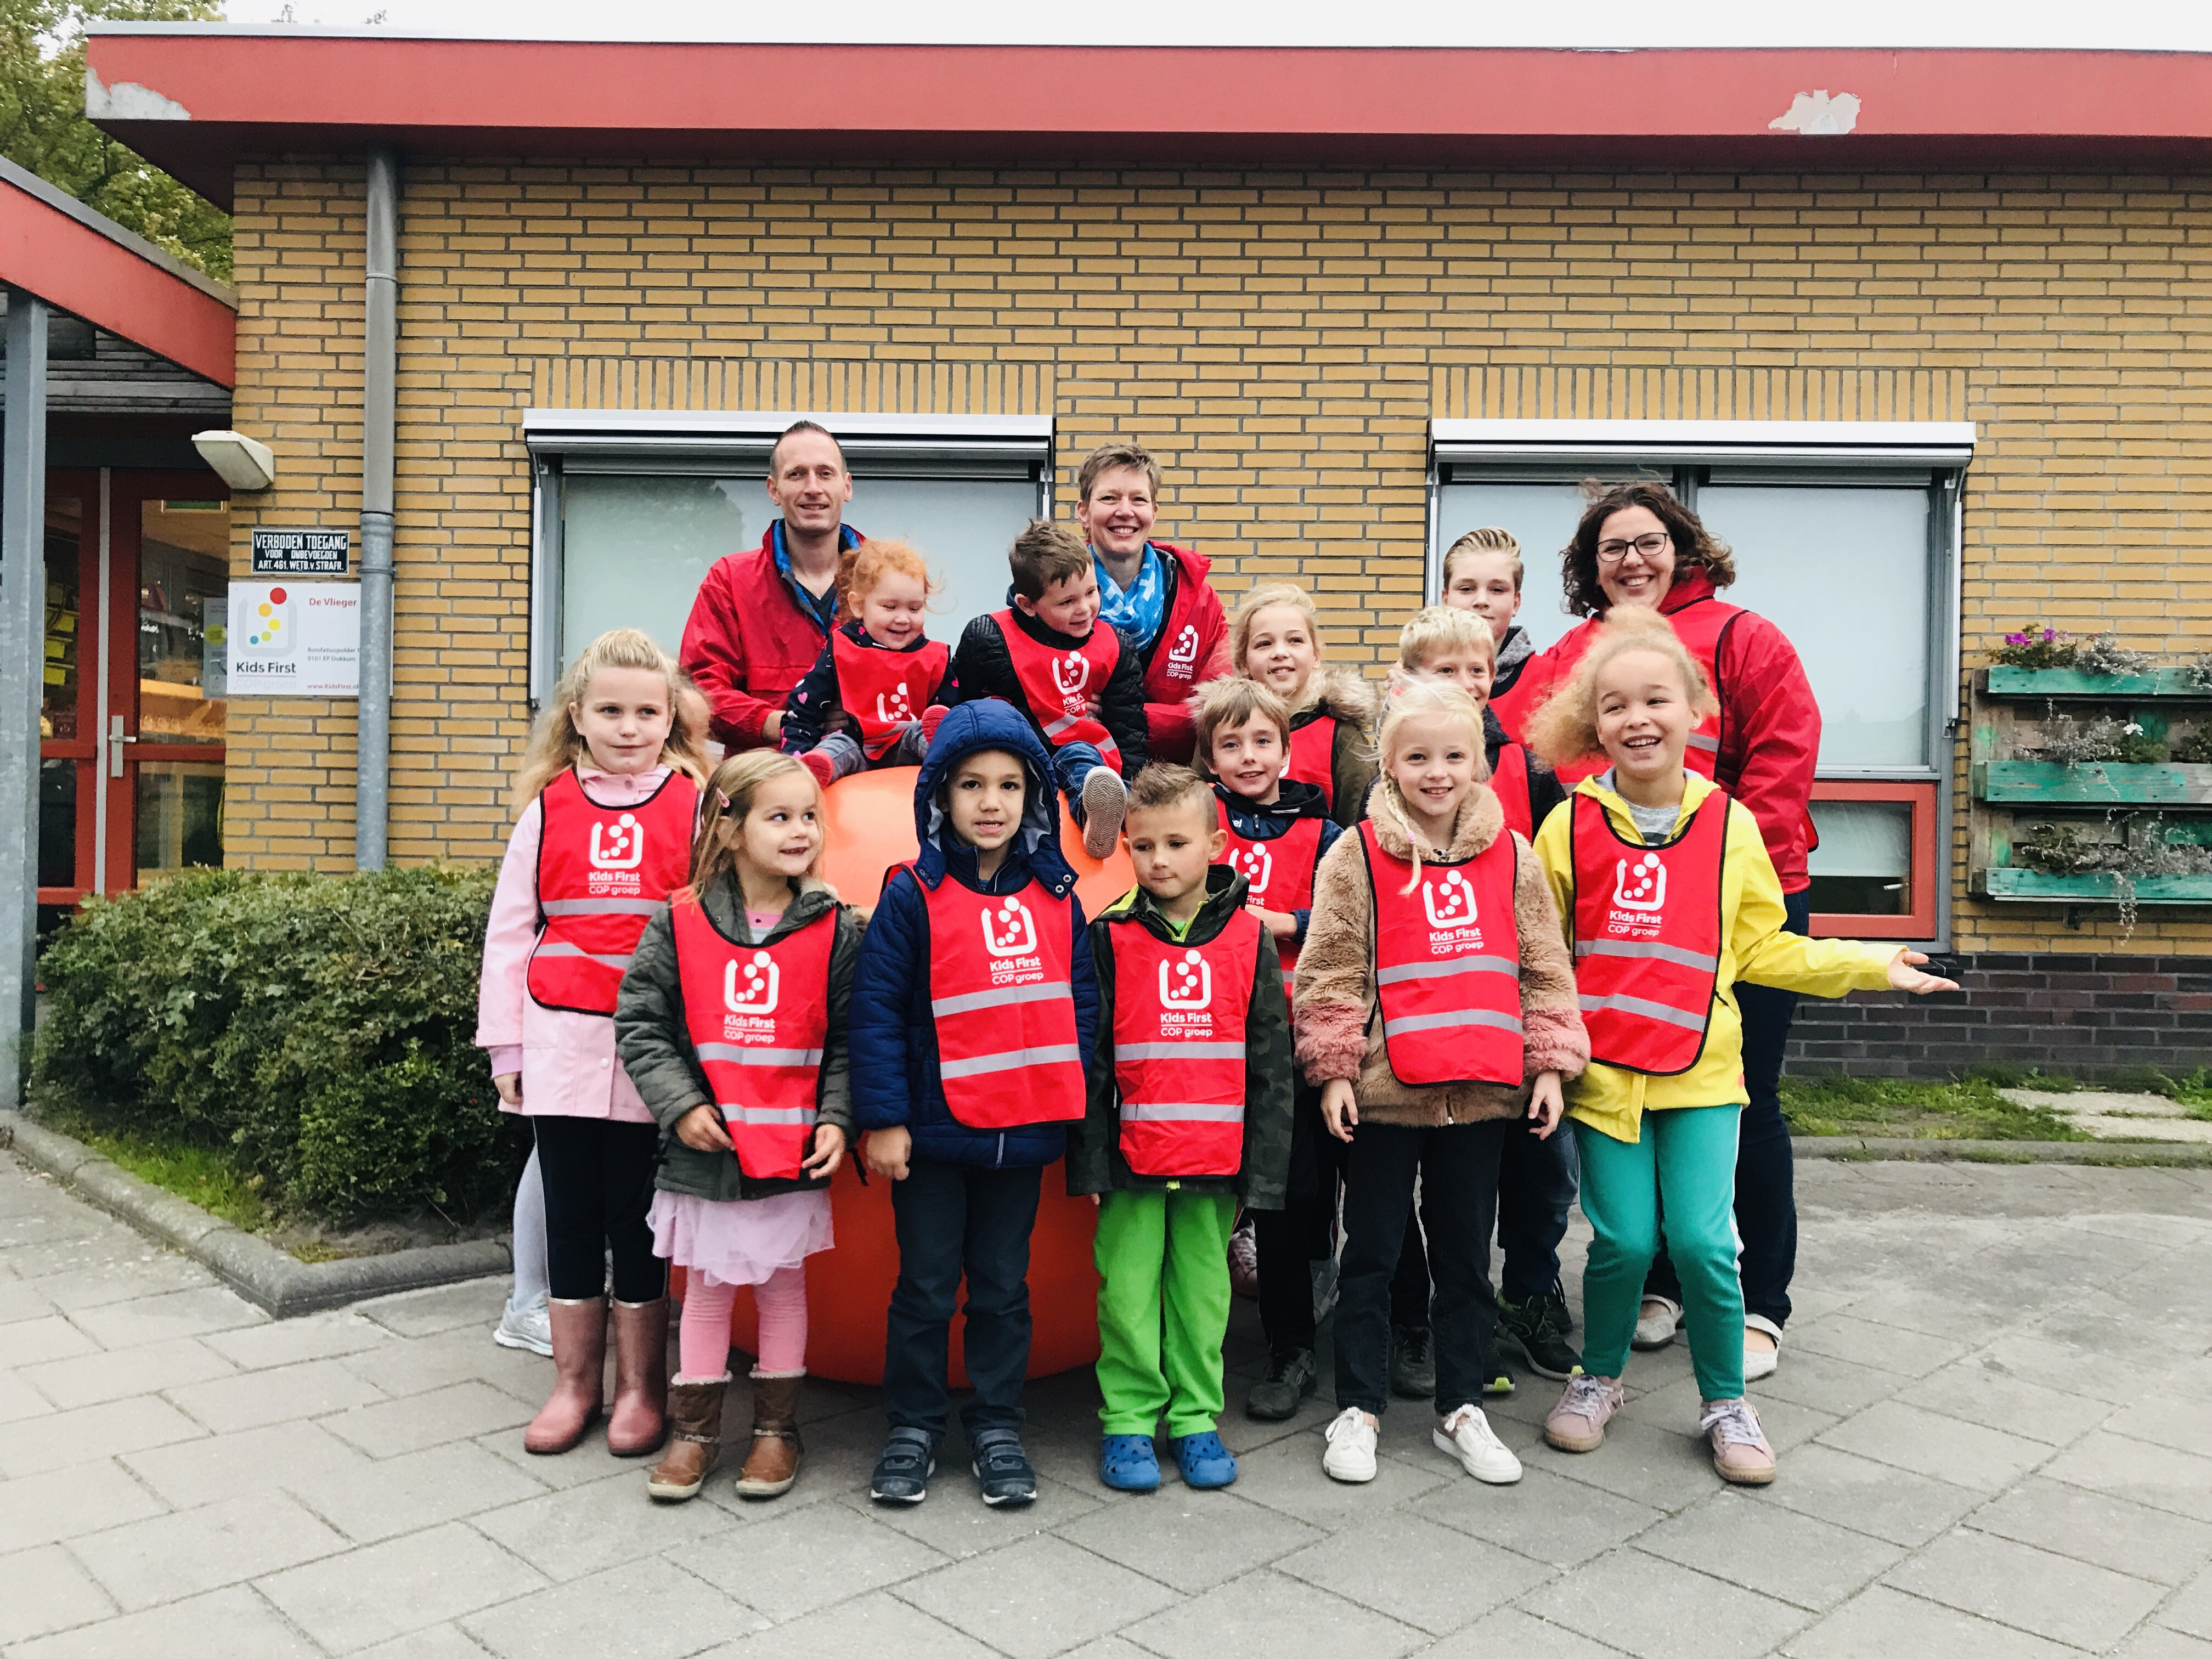 Rollen tegen roken -2018 Kids First COP groep Friesland